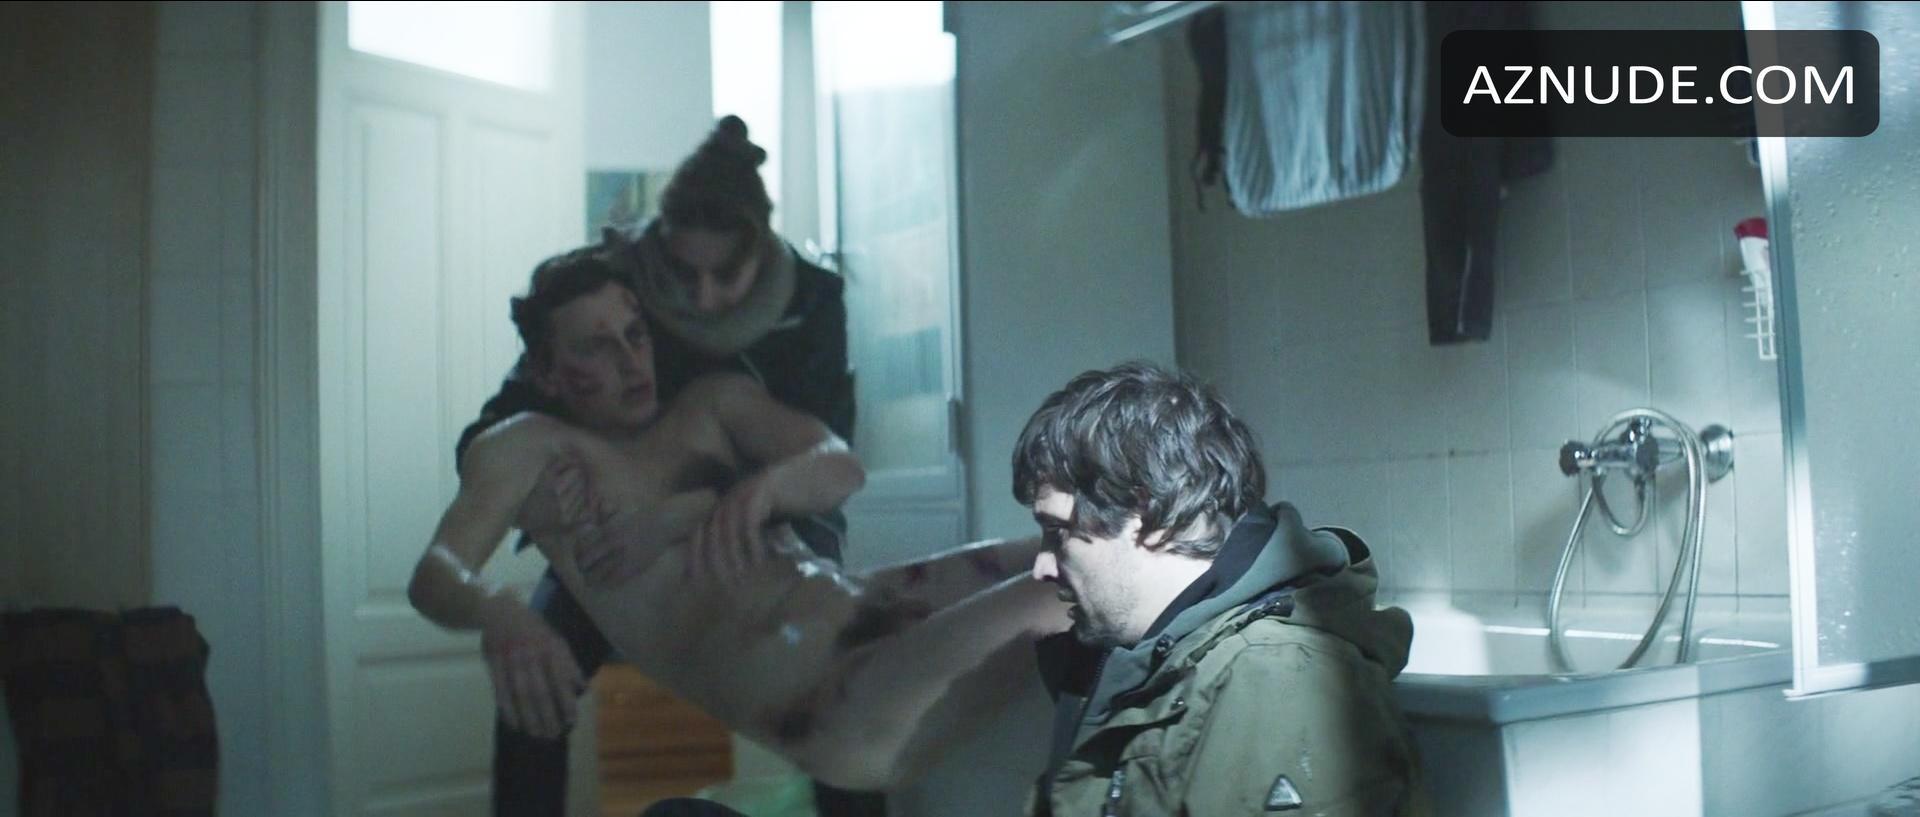 Celebrity sex scene brad pitt and helena bonham carter fight club 9